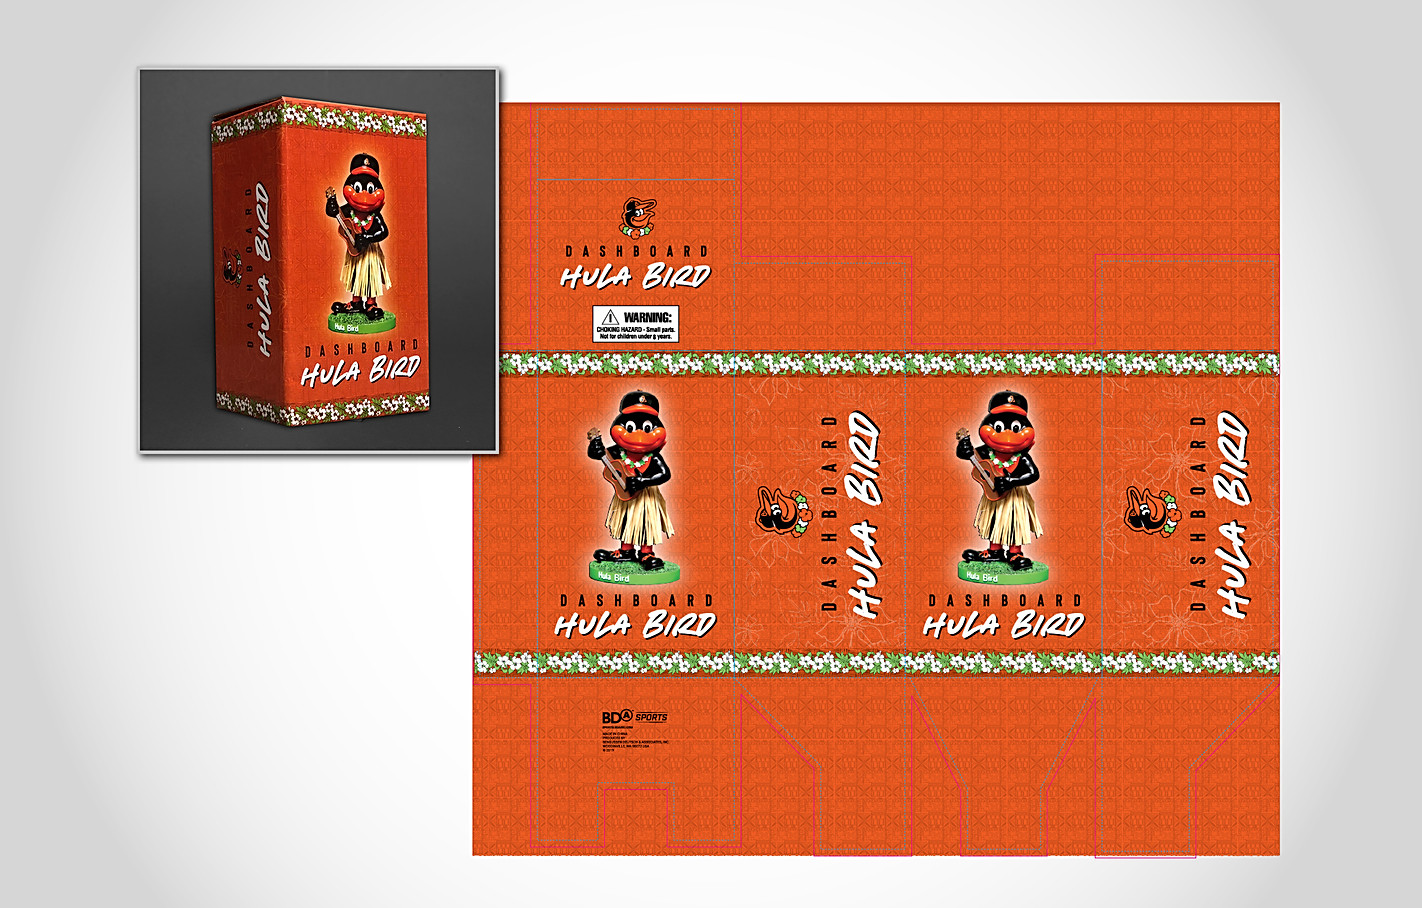 Orioles Hula Bird Packaging